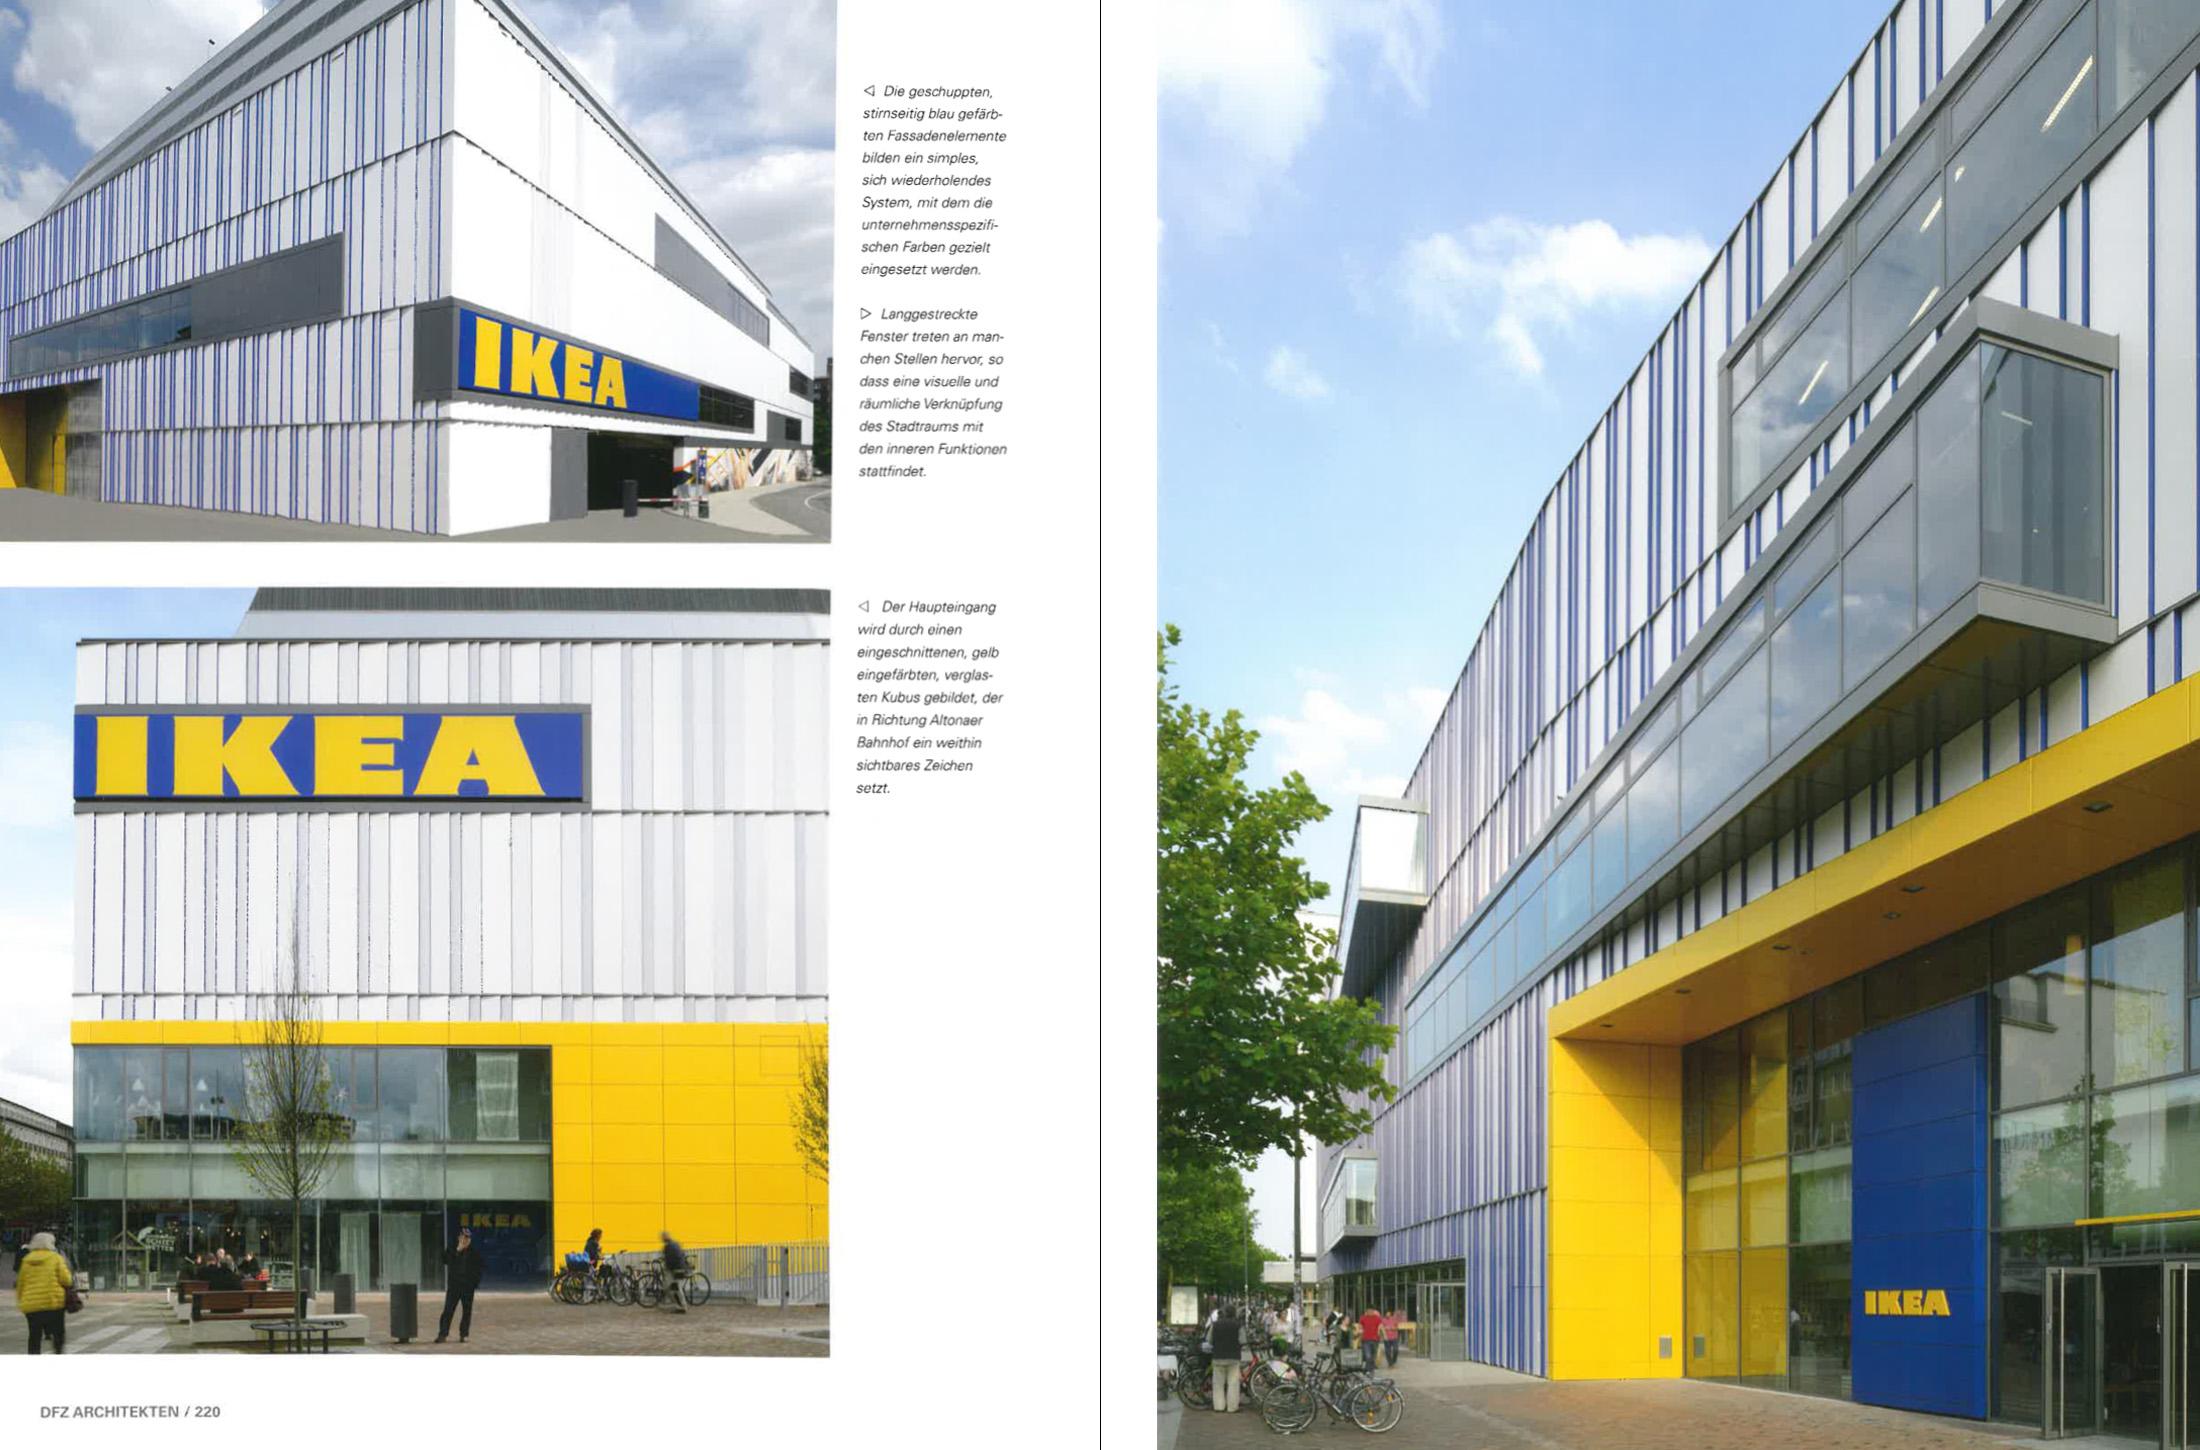 Corporate architecture ikea altona hamburg dfz architekten for Architekten hamburg altona